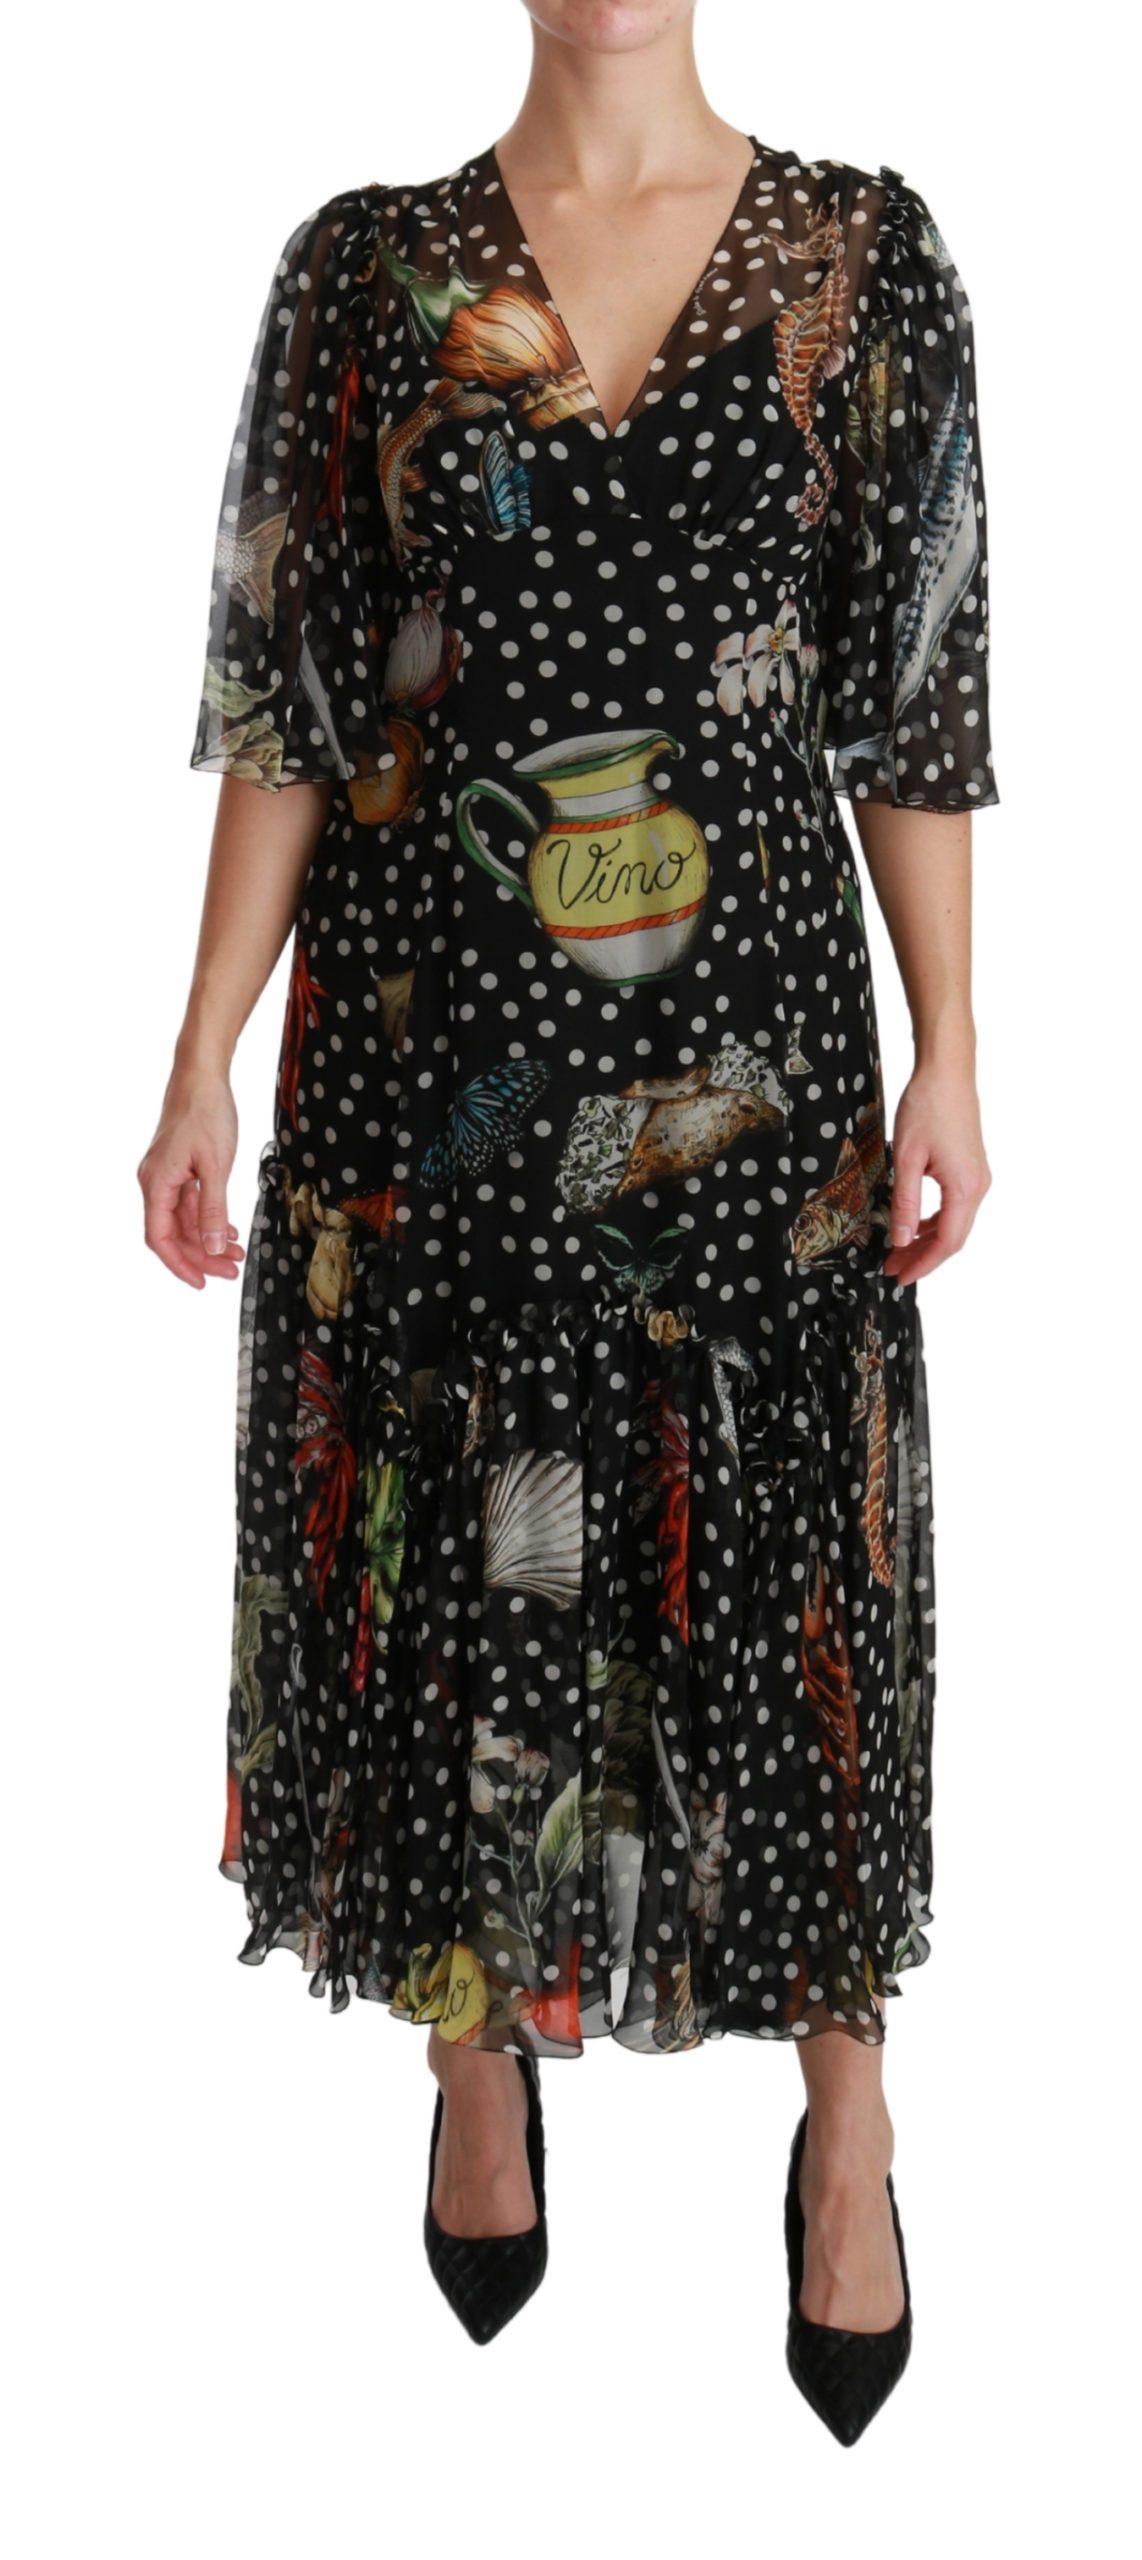 Dolce & Gabbana Women's Sea Fish Sicily A-line Shift Dress Black DR2540 - IT42 M